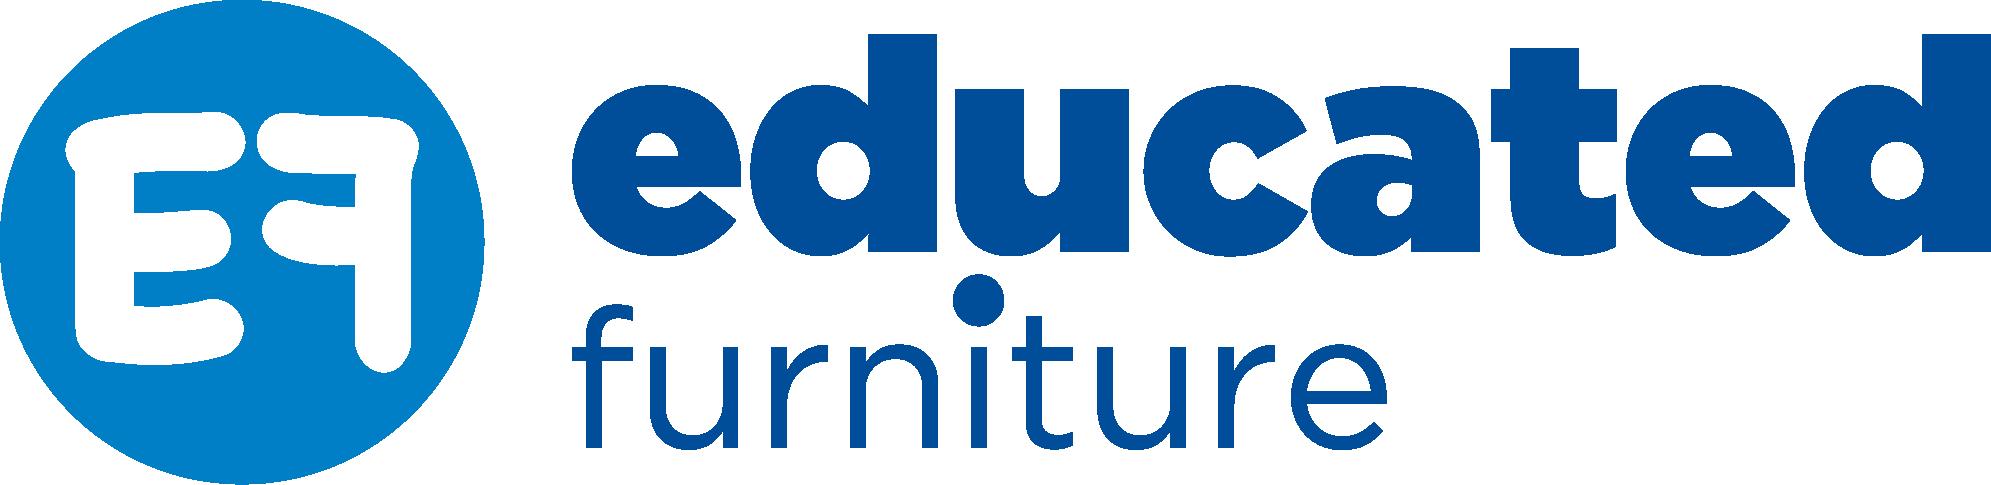 Educated Furniture